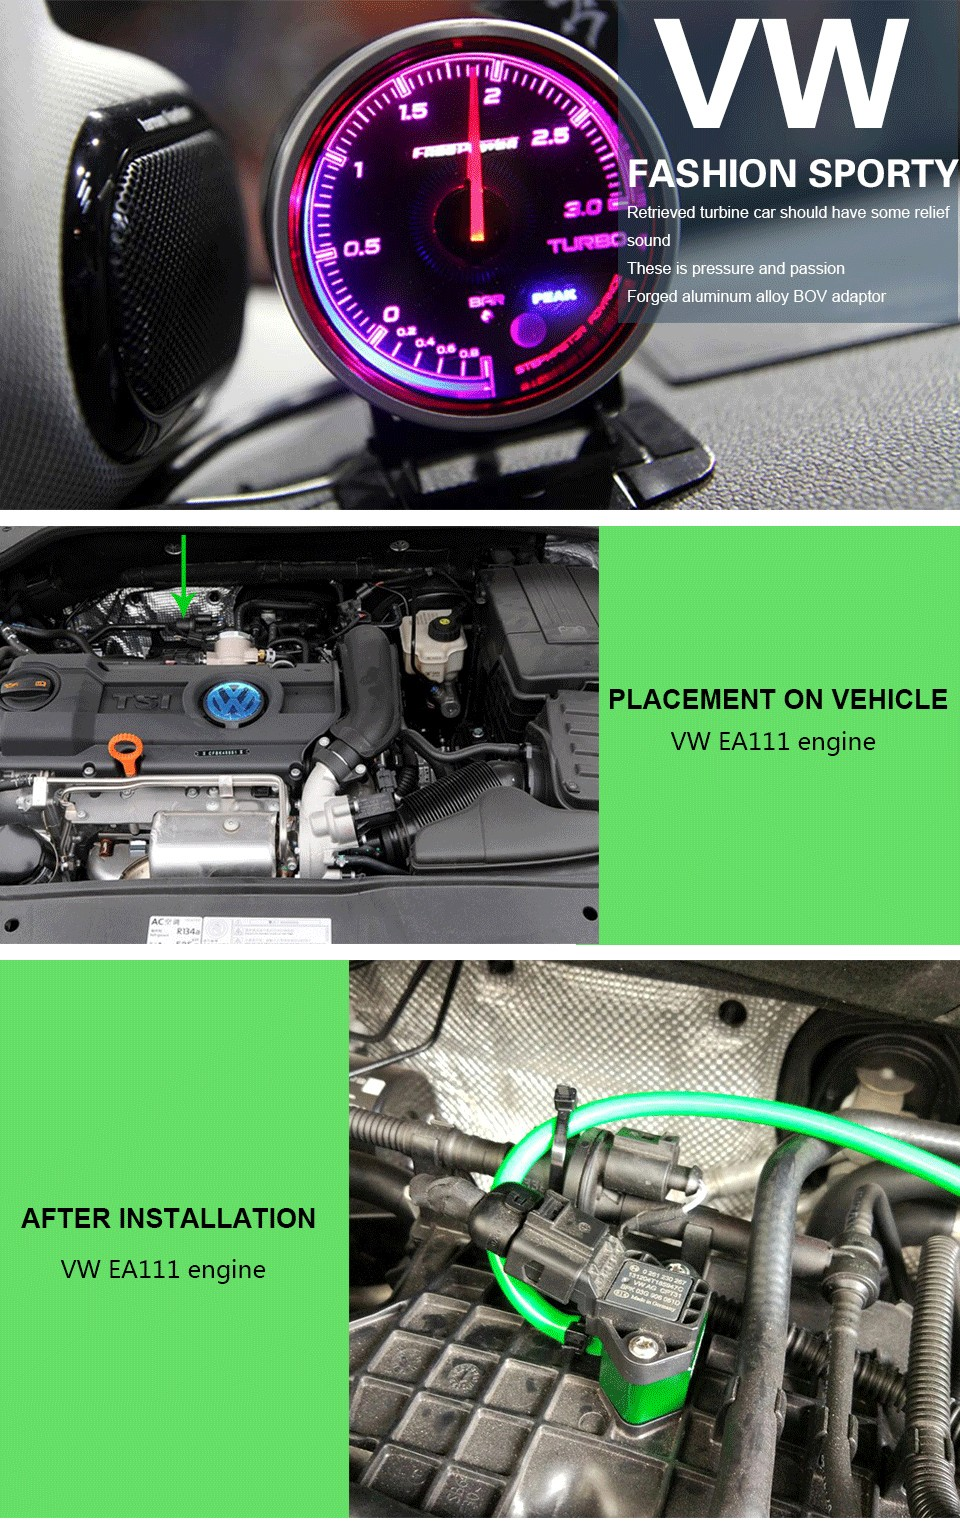 Blow Off Valve Vacuum Adapter Boost Tap For Vw/audi 1 4t Ea111 Engine!  Aluminum Alloy! Connecting A Boost Gauge  Savanini - Buy Boost Tap,Vacuum